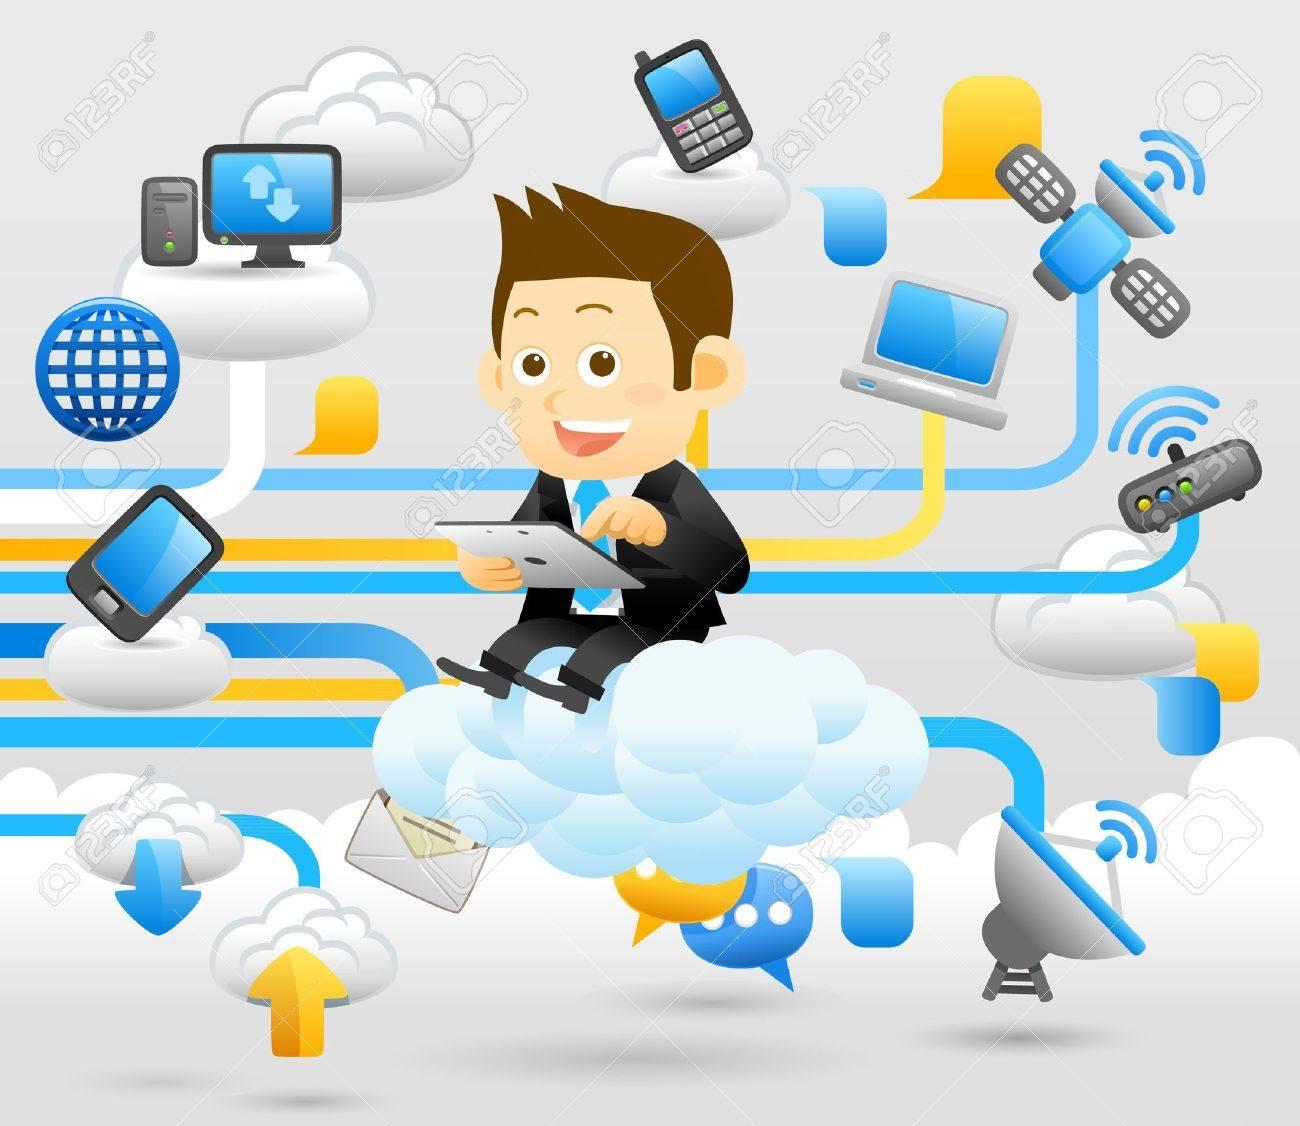 Elegant People Series - Business man ,Cloud computing concept Stock Vector - 13543870